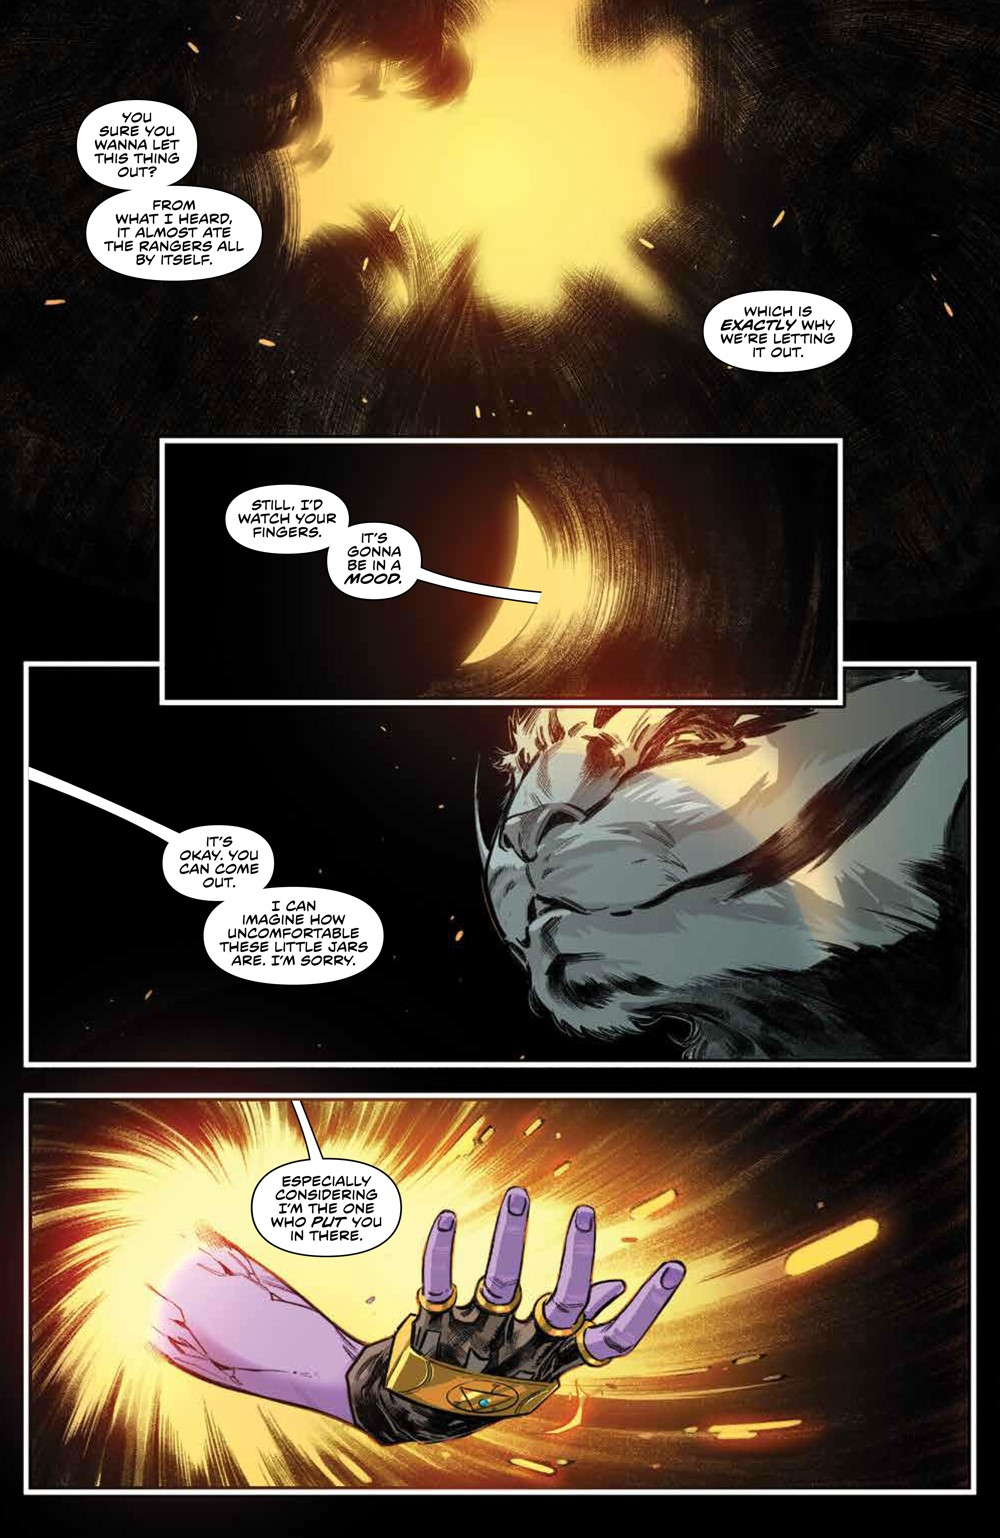 PowerRangers_010_PRESS_3 ComicList Previews: POWER RANGERS #10